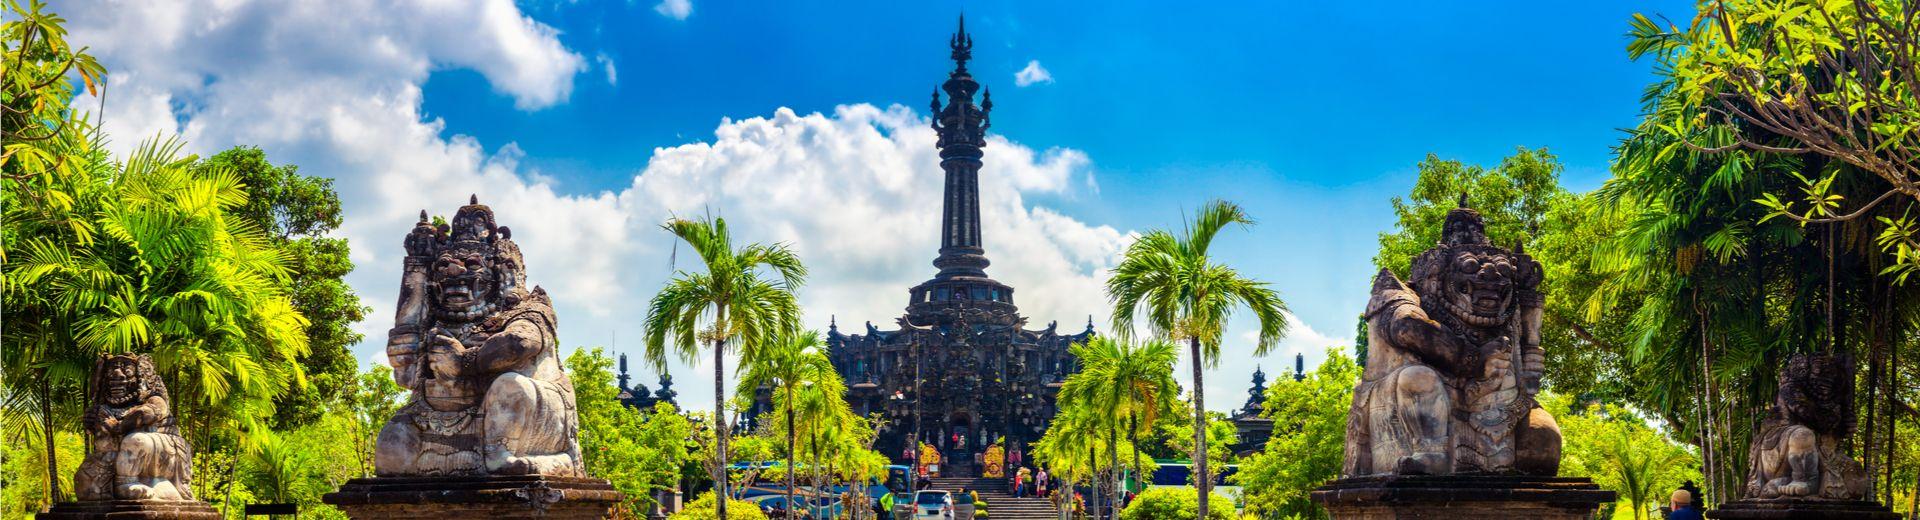 Im Dezember nach Bali